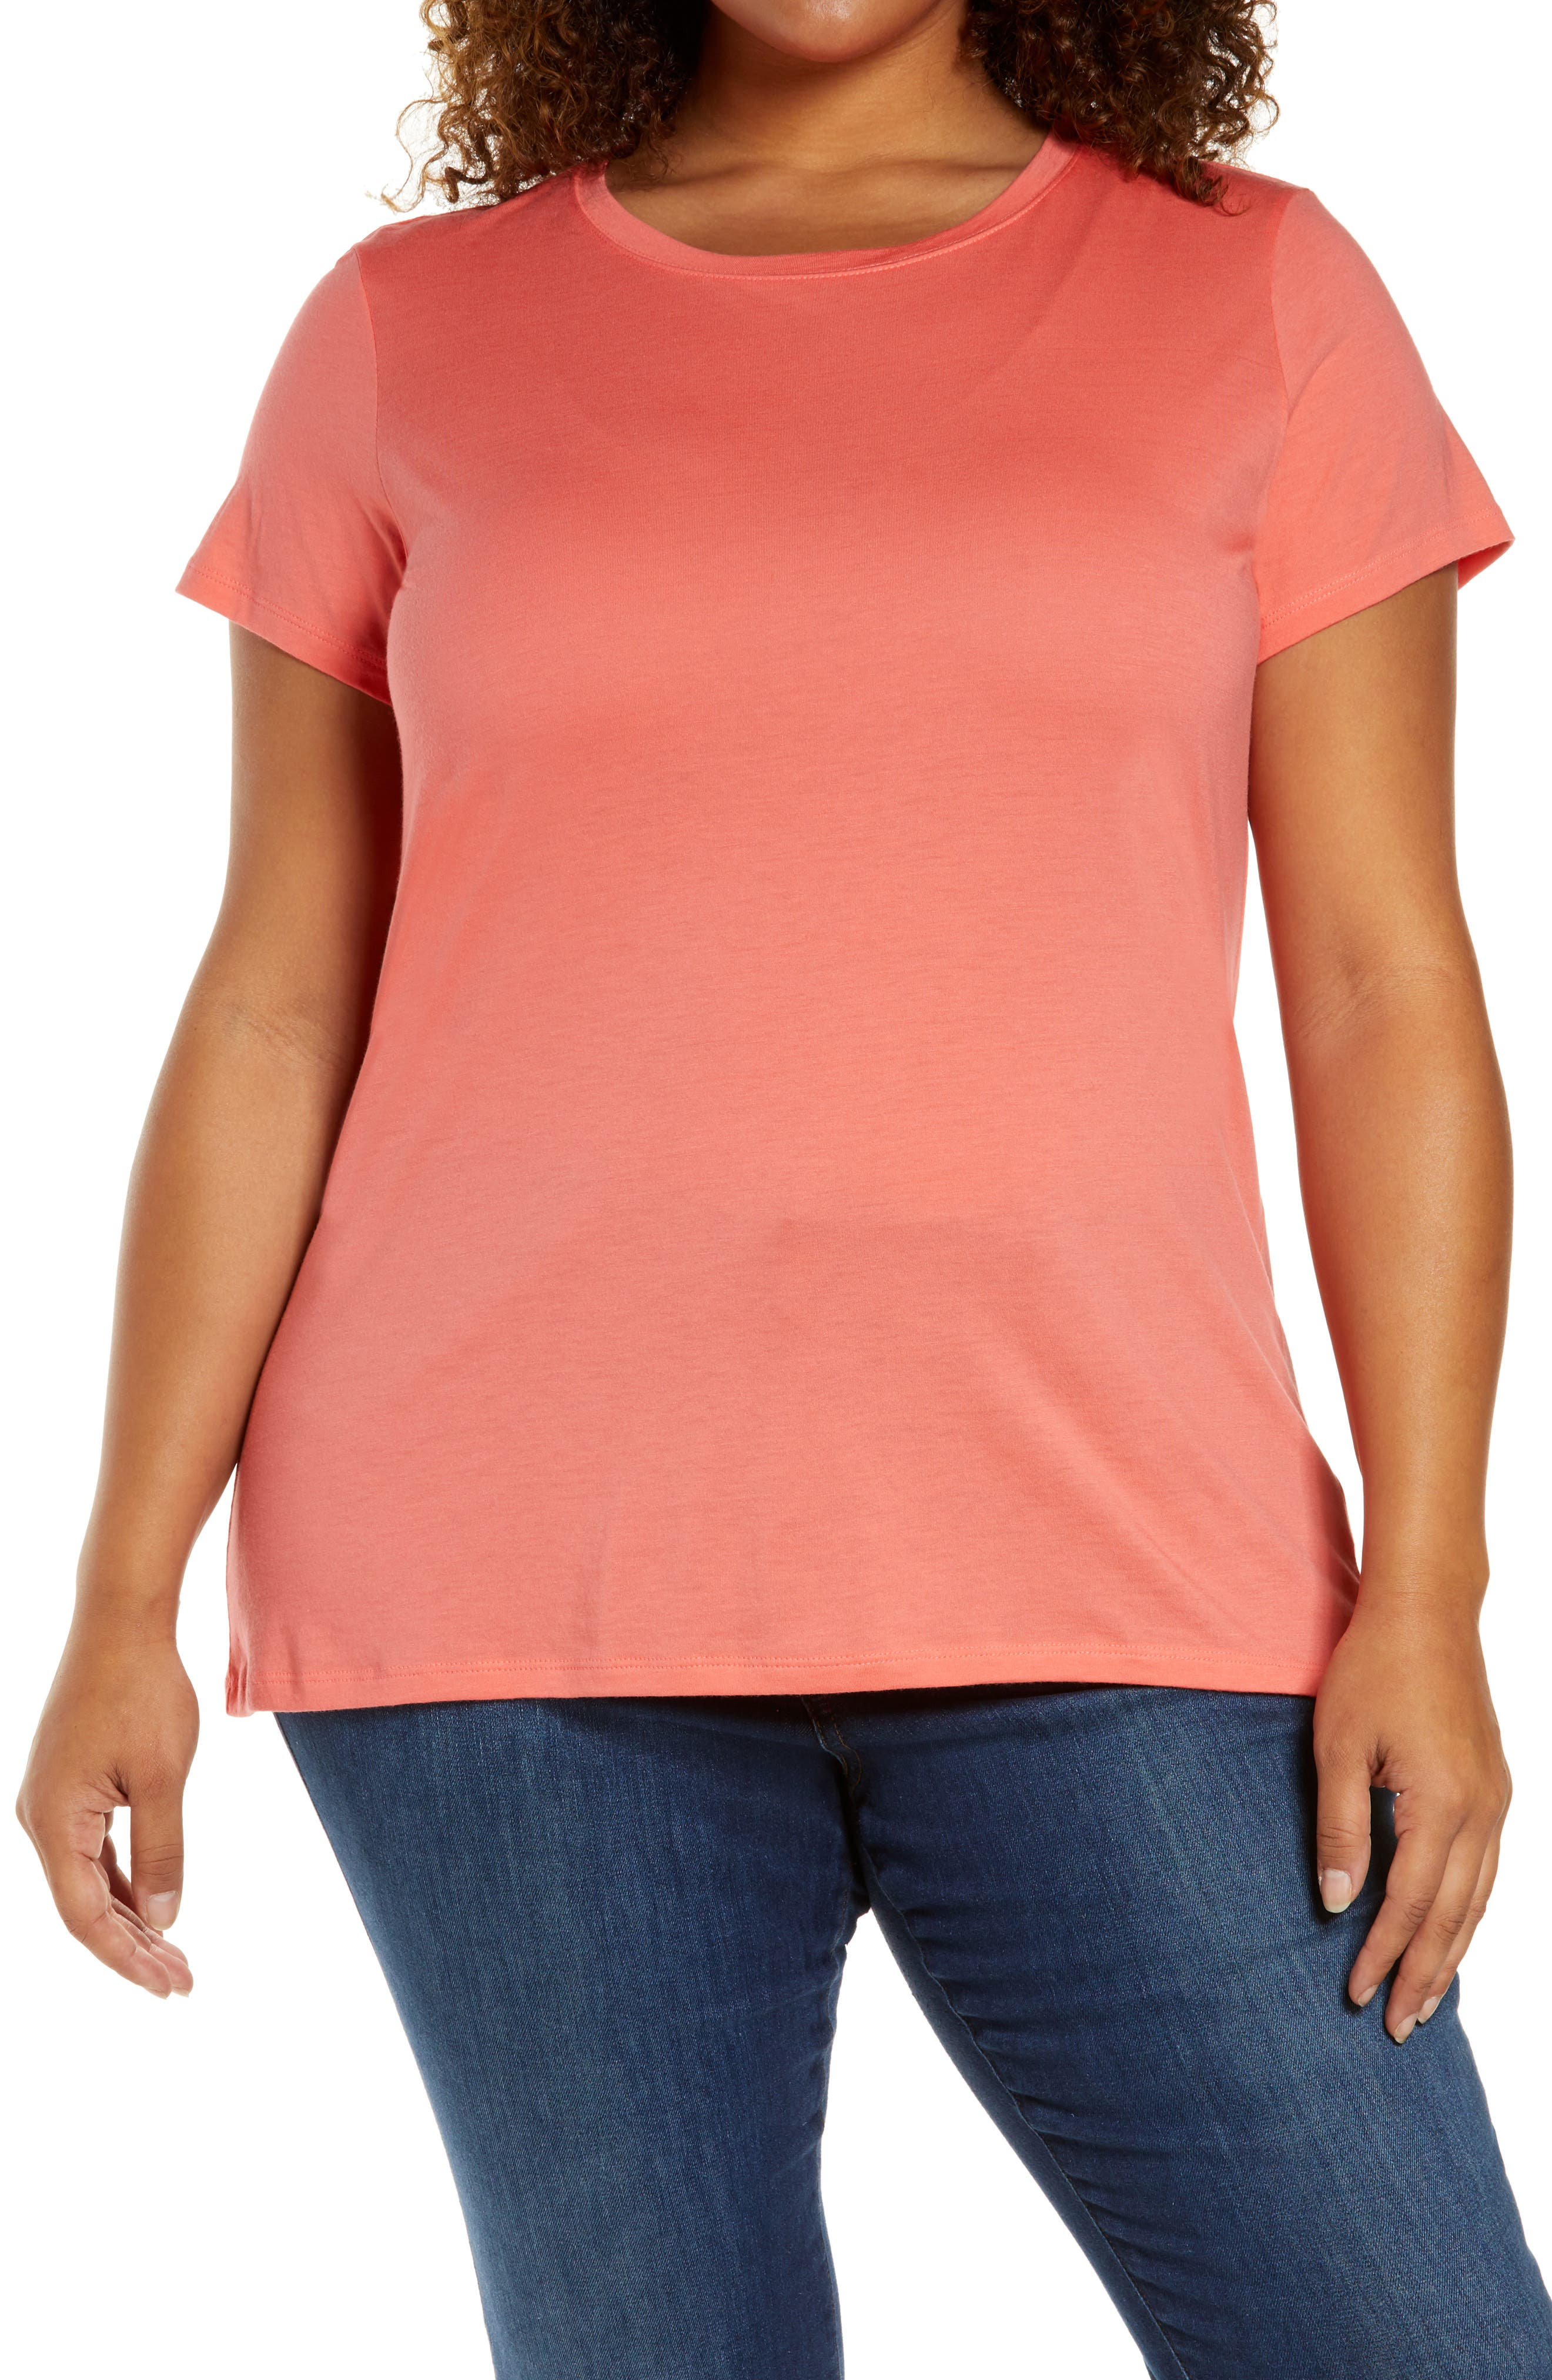 Plus Size Women's Halogen Jersey Crewneck Shirt